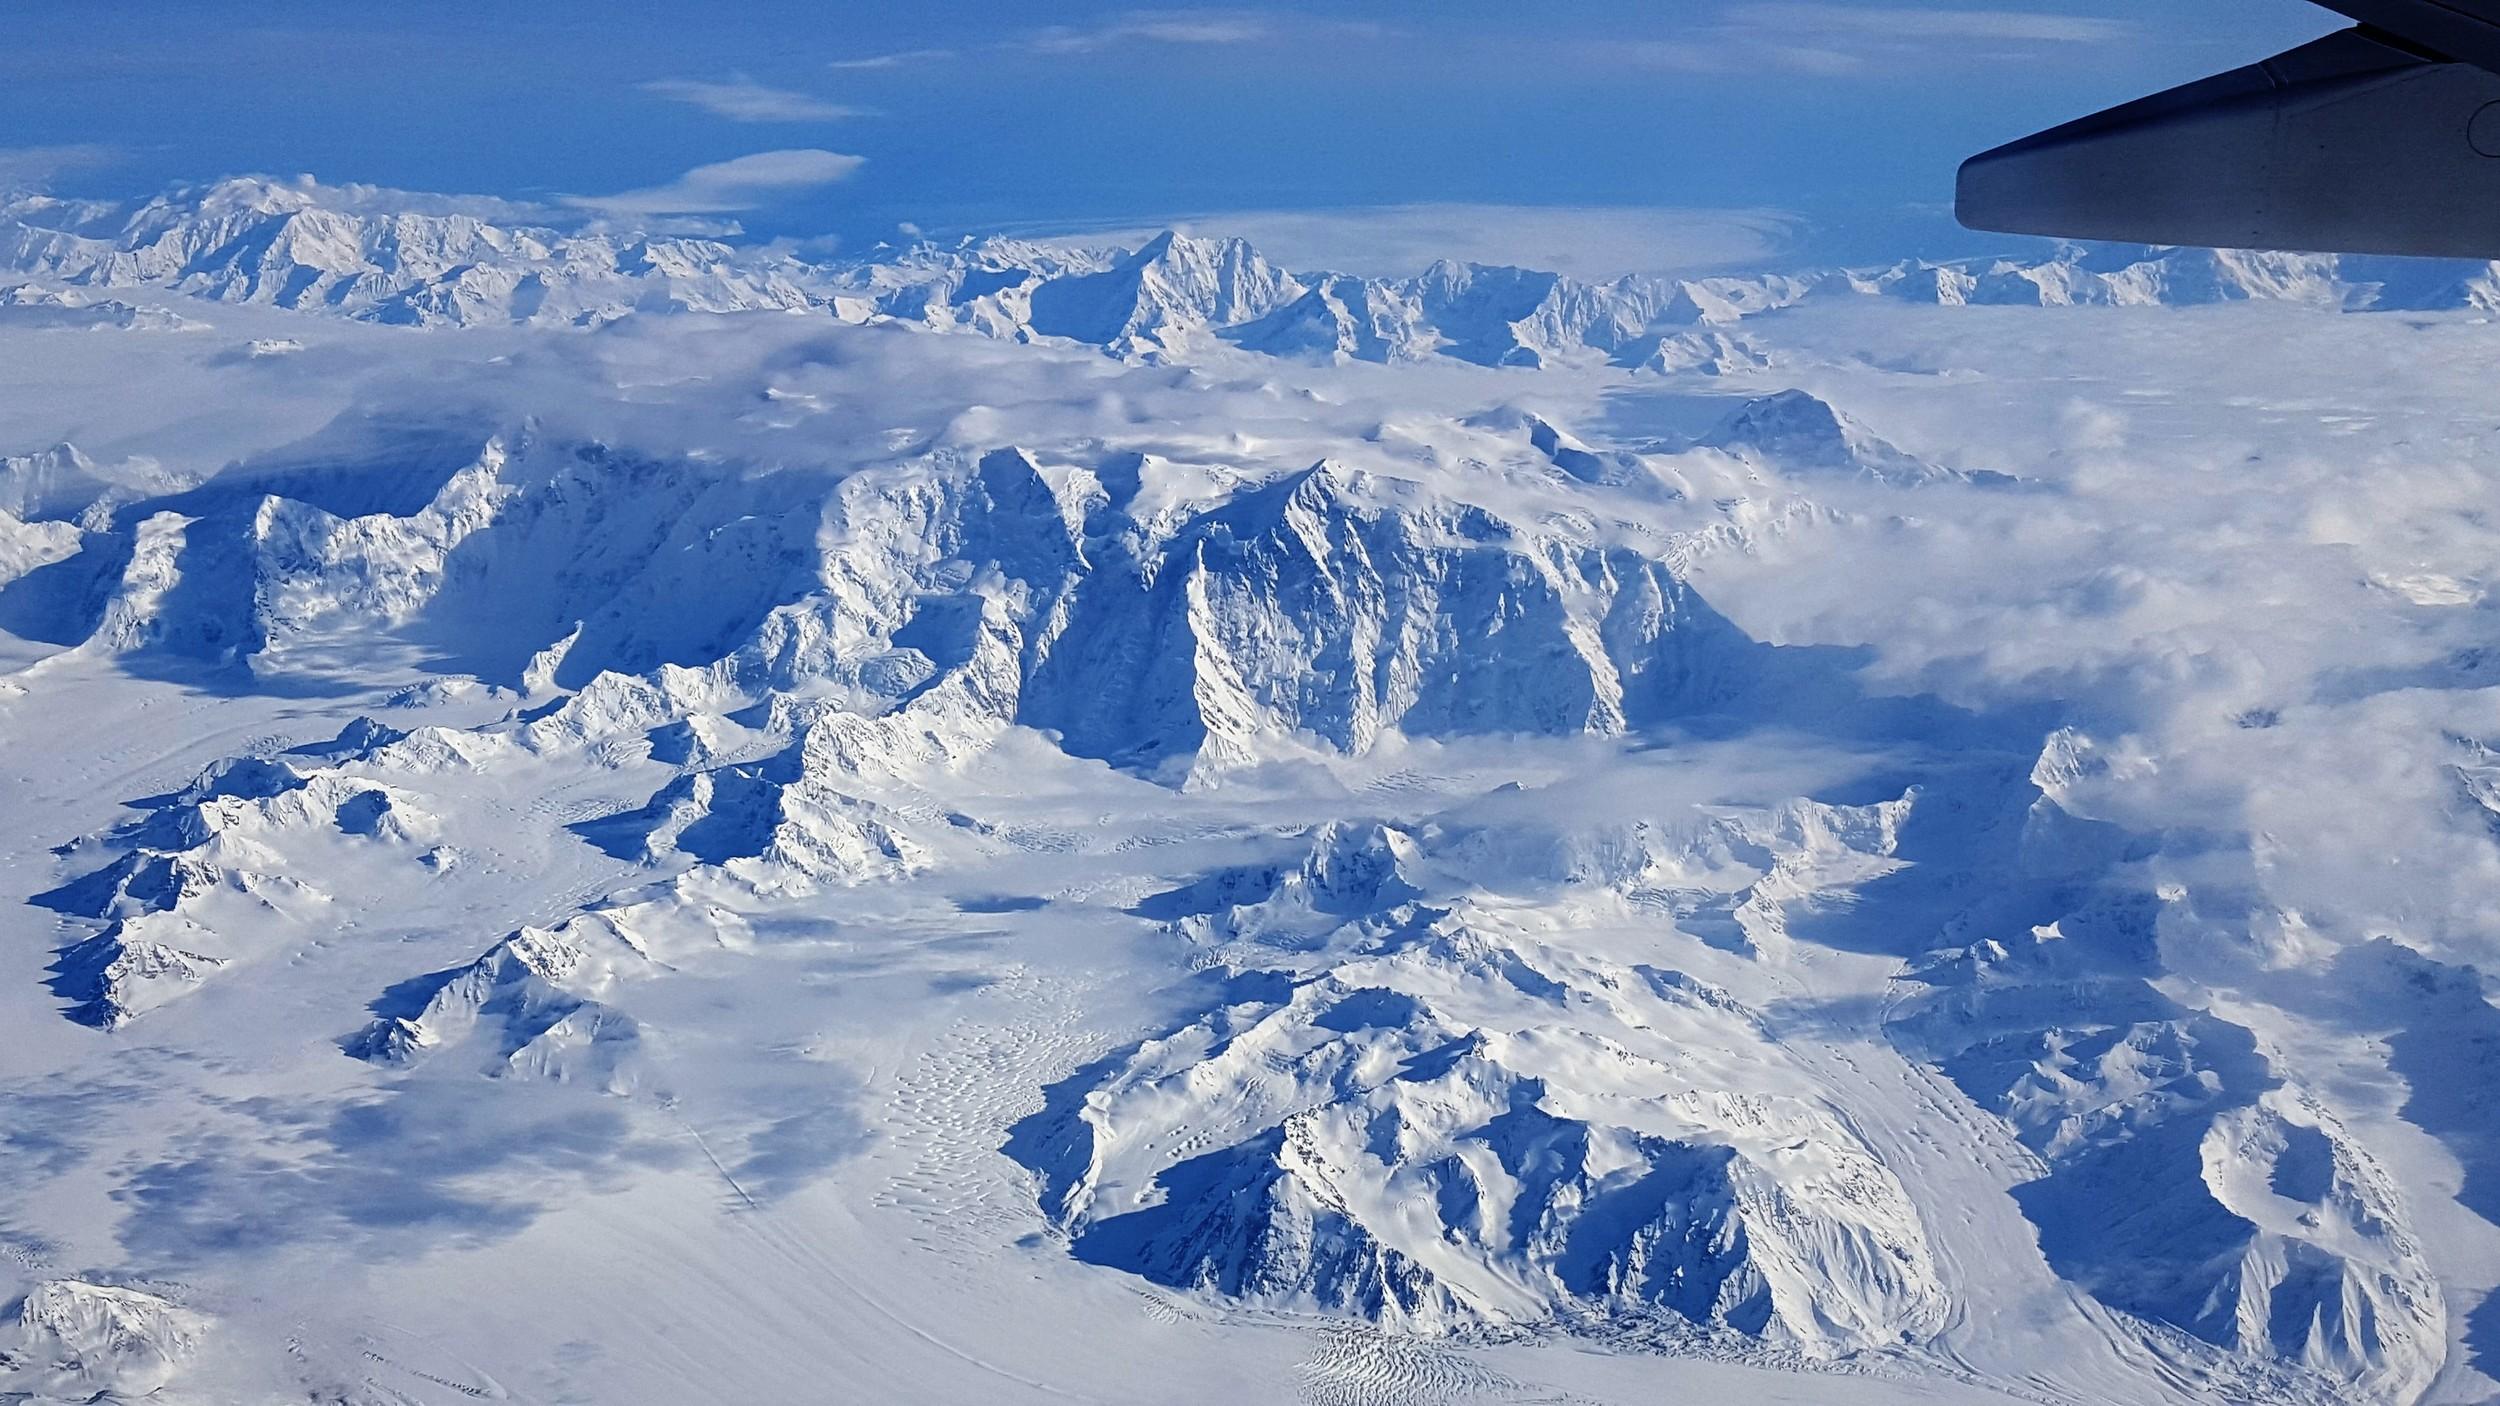 mt logan 19,551 feet.jpg